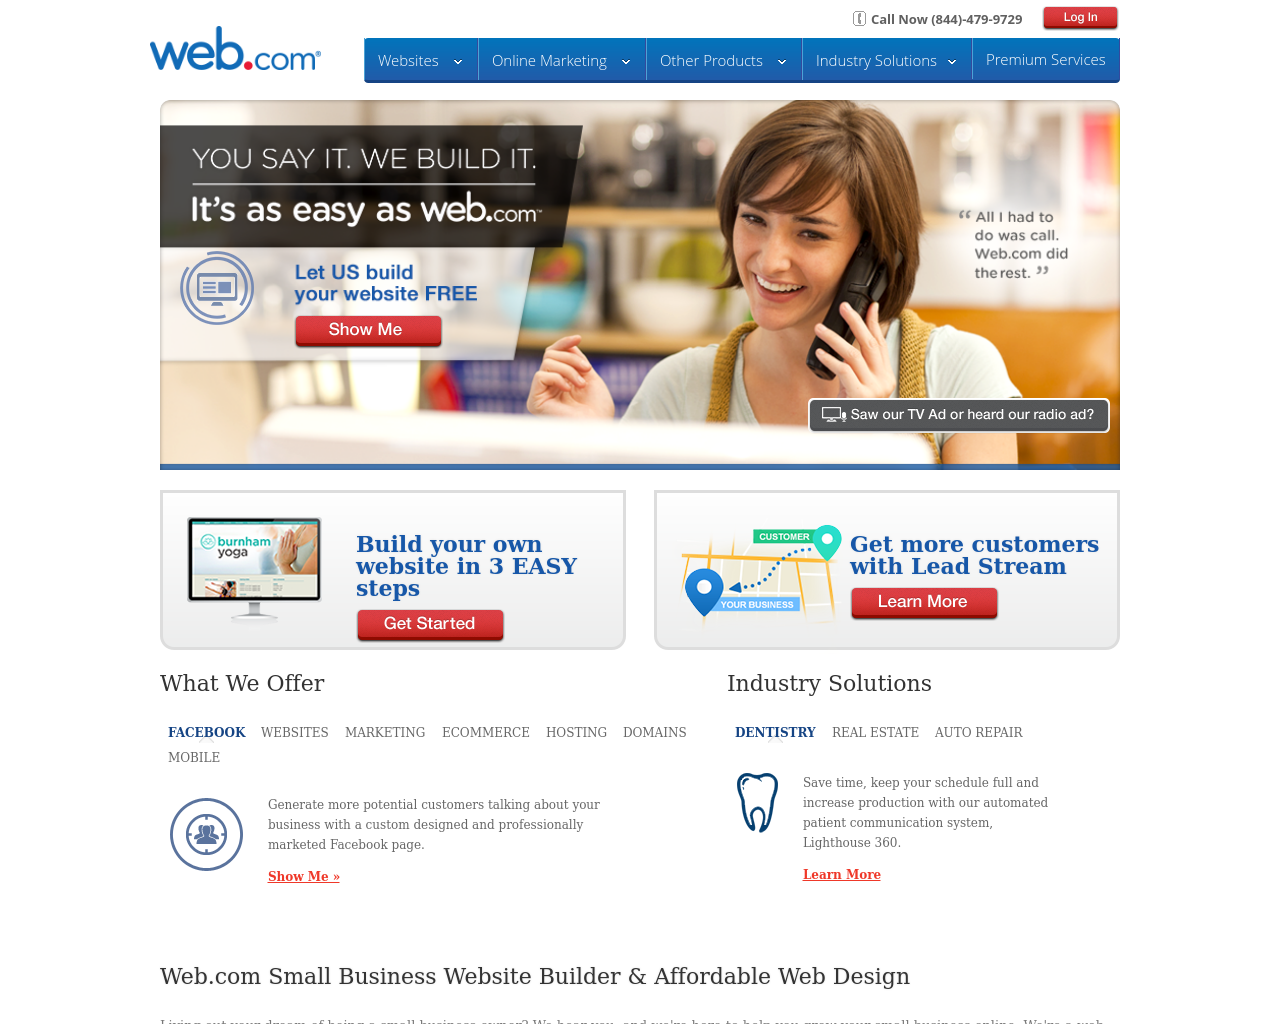 Web.com-Advertising-Reviews-Pricing